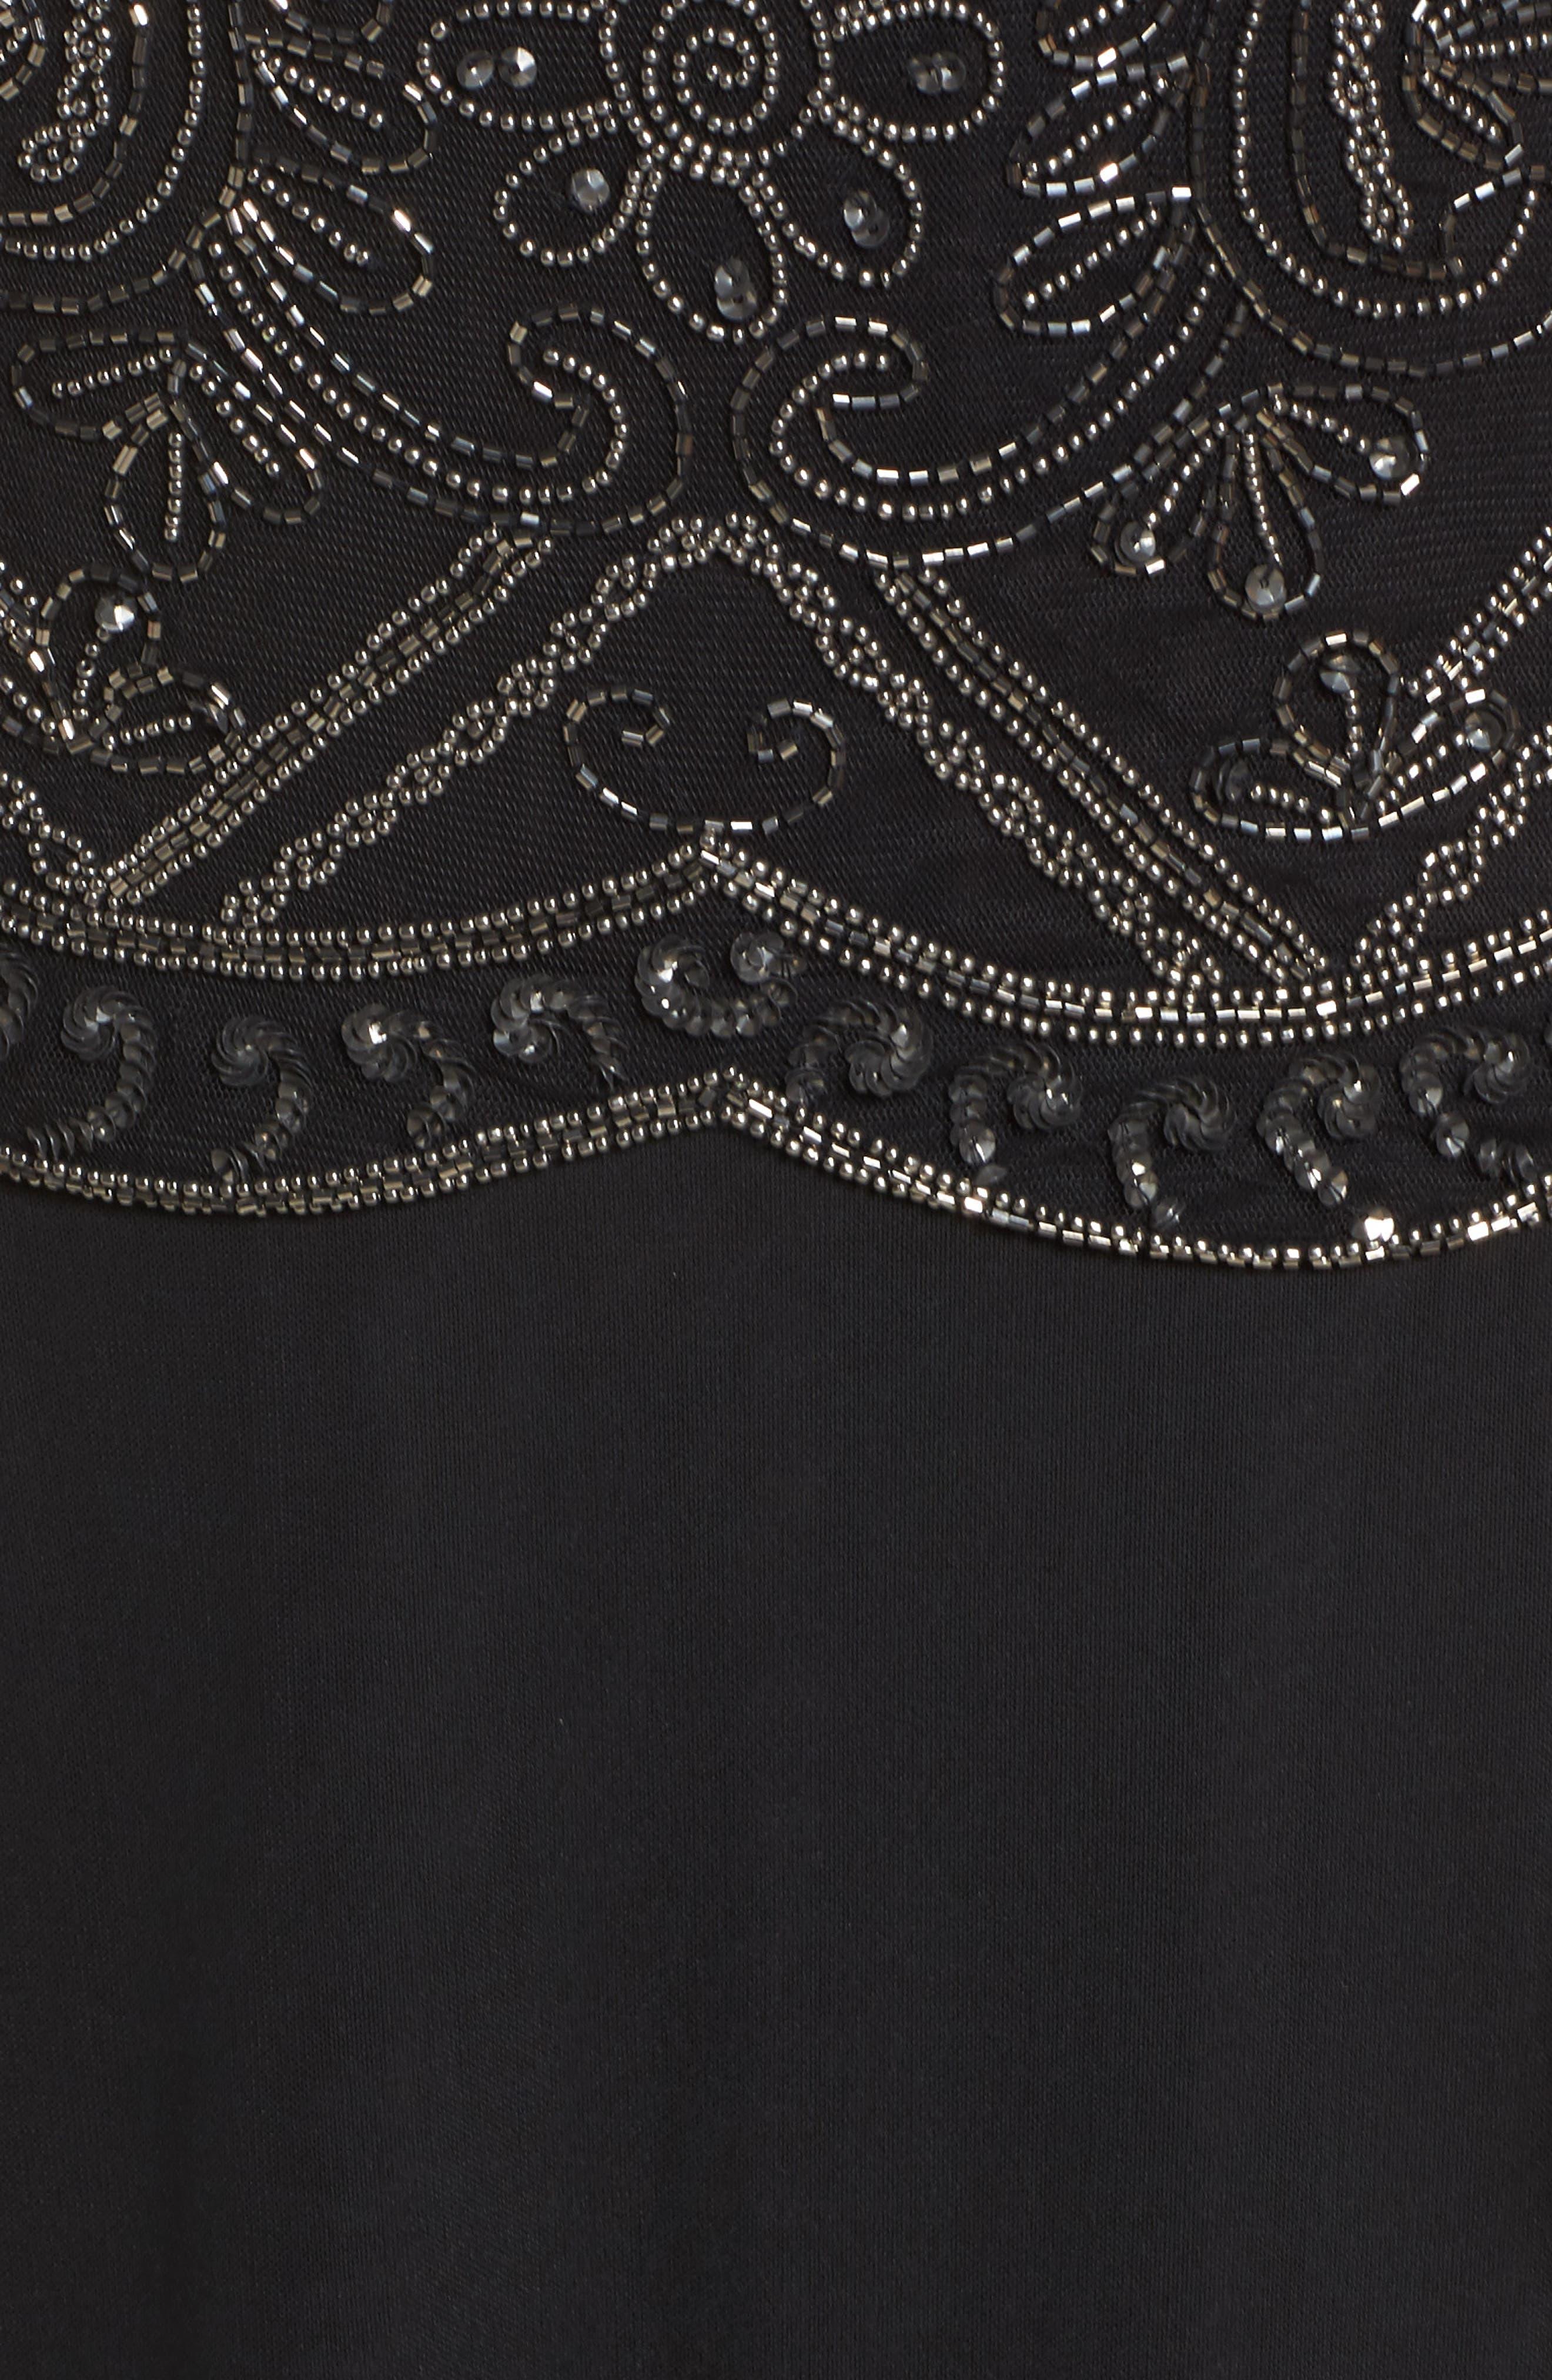 Embellished Cap Sleeve Long Dress,                             Alternate thumbnail 5, color,                             Black